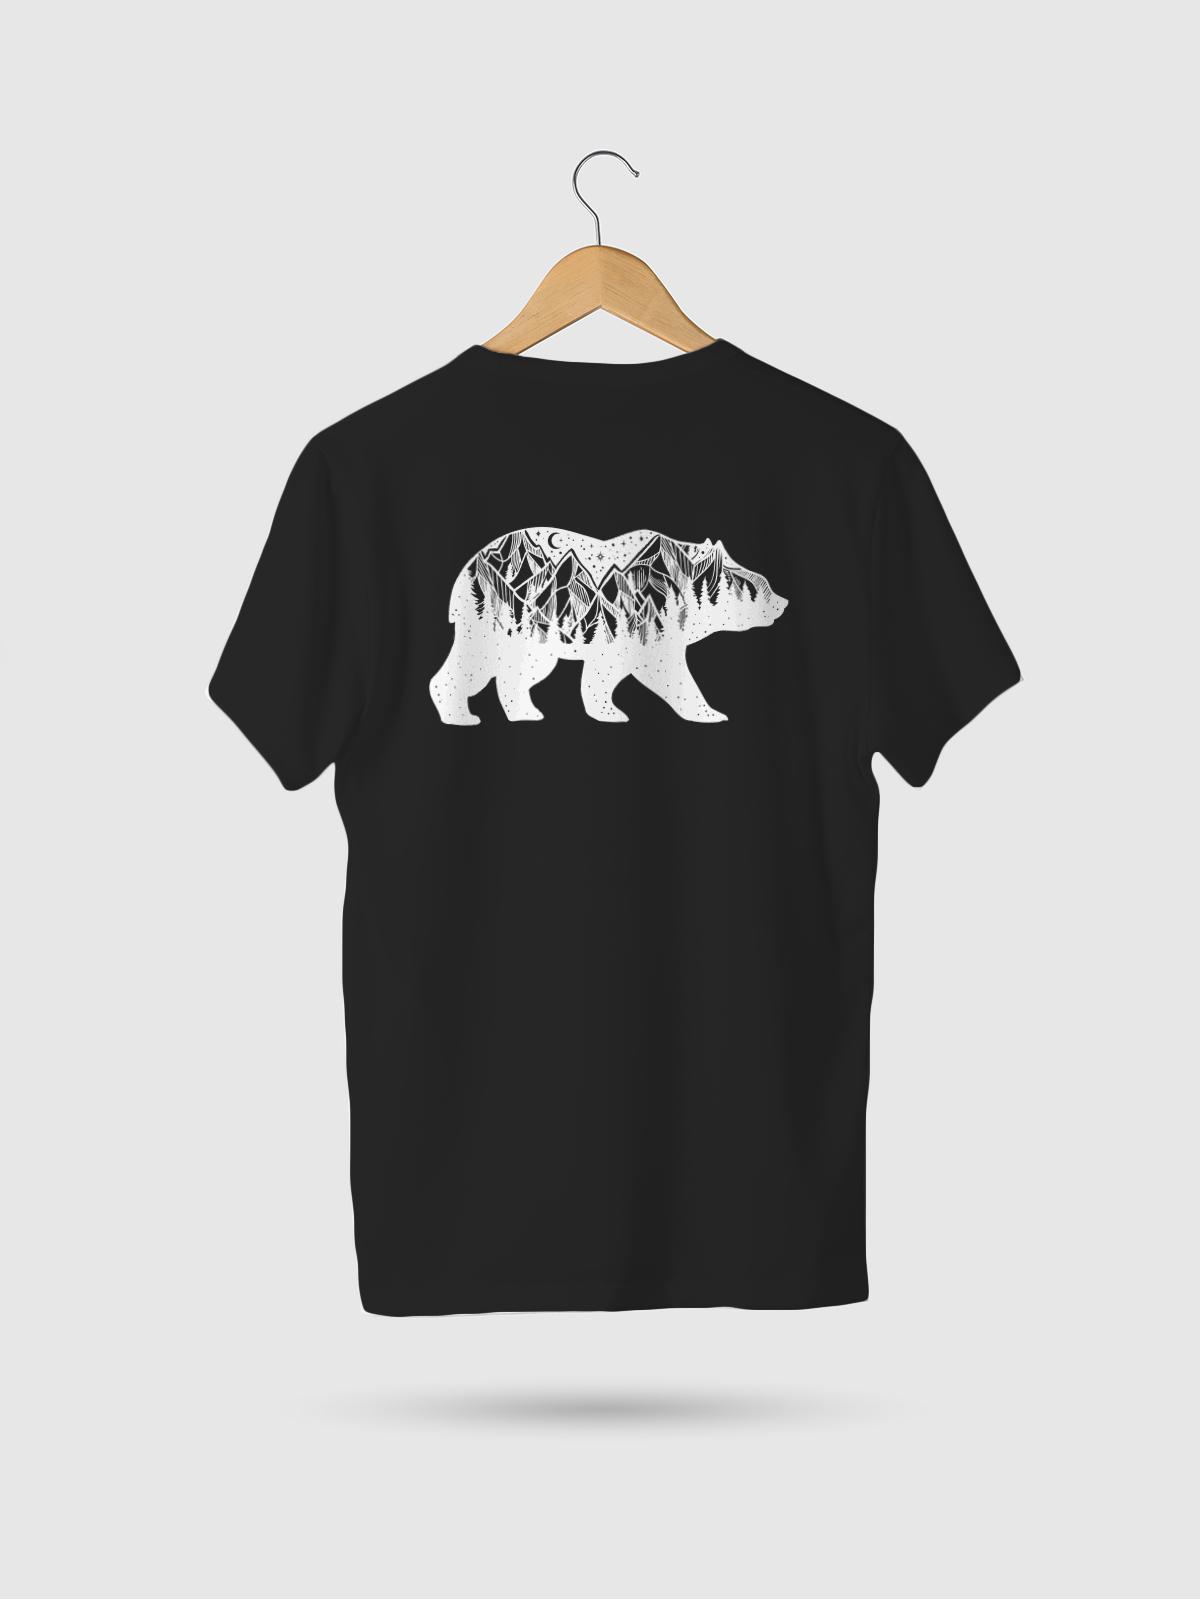 roaming bear back